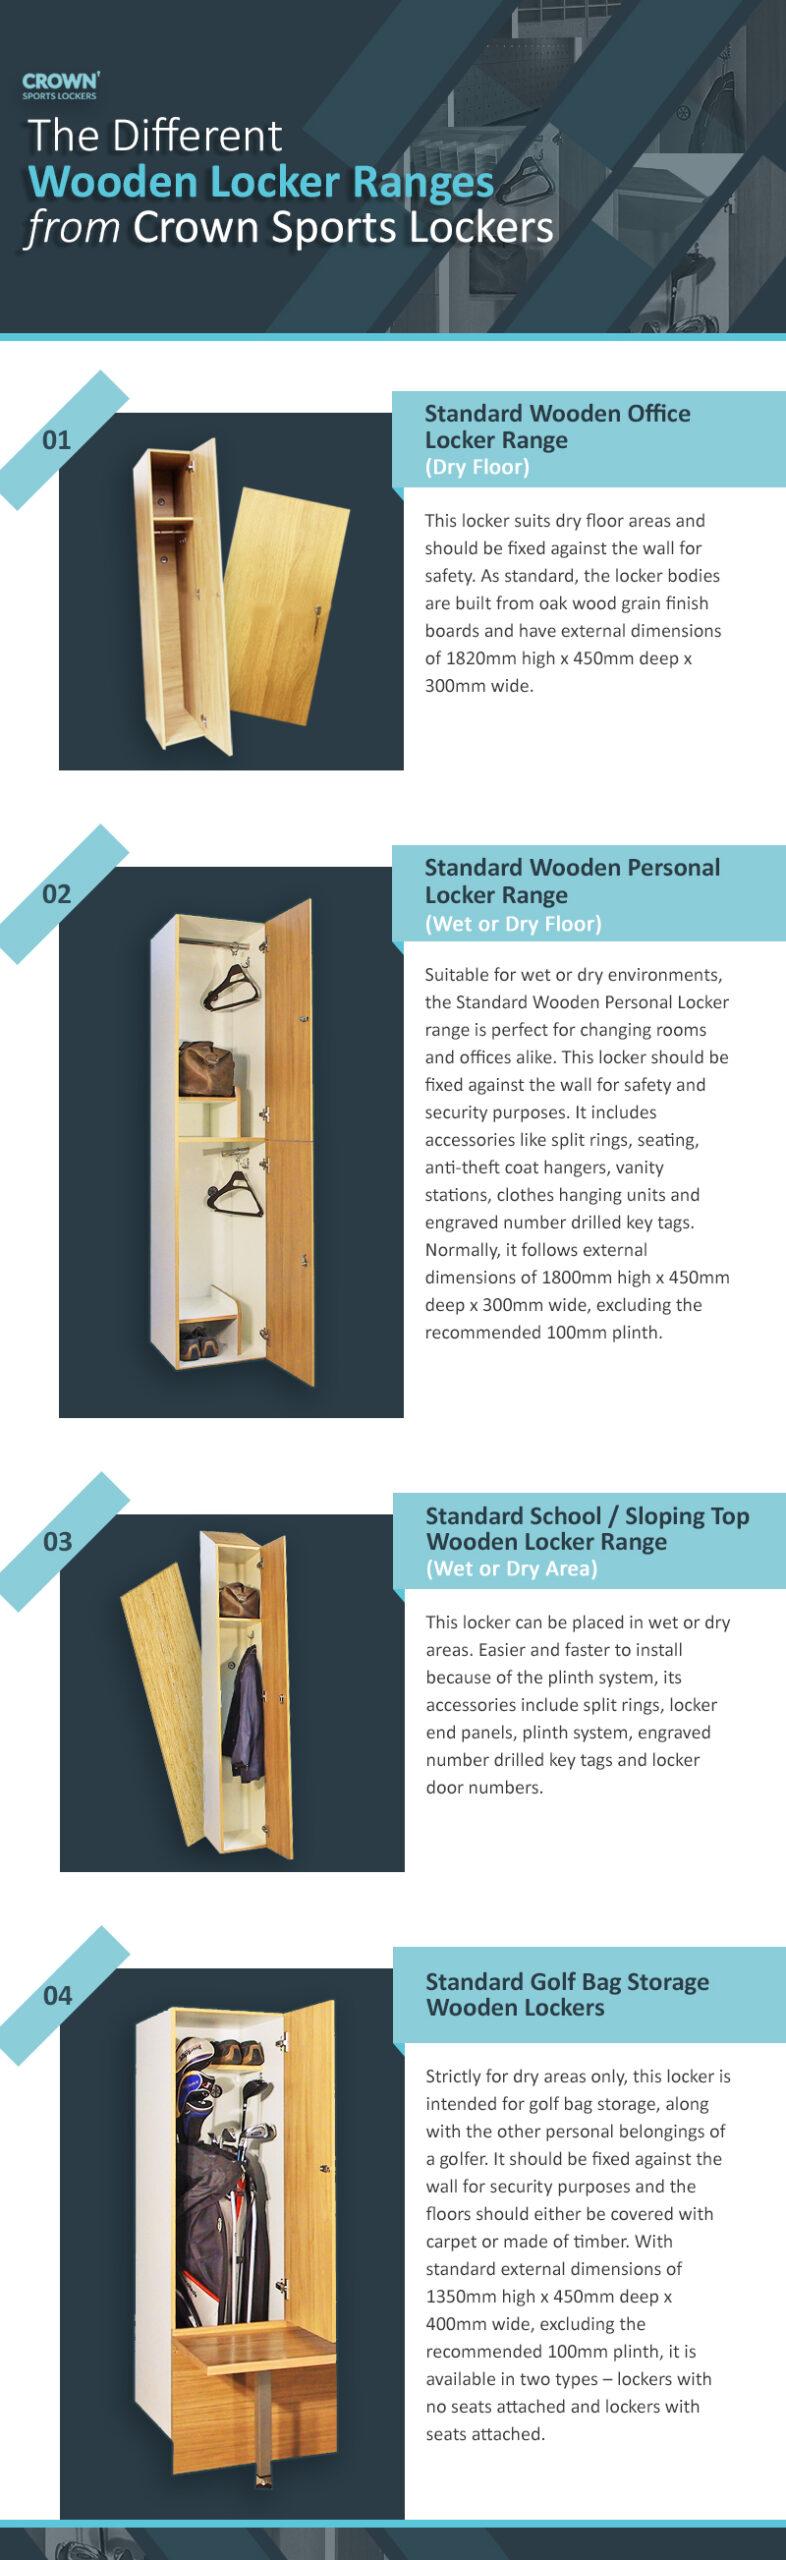 Crown Sports Lockers - Different Wooden Locker Range Revised